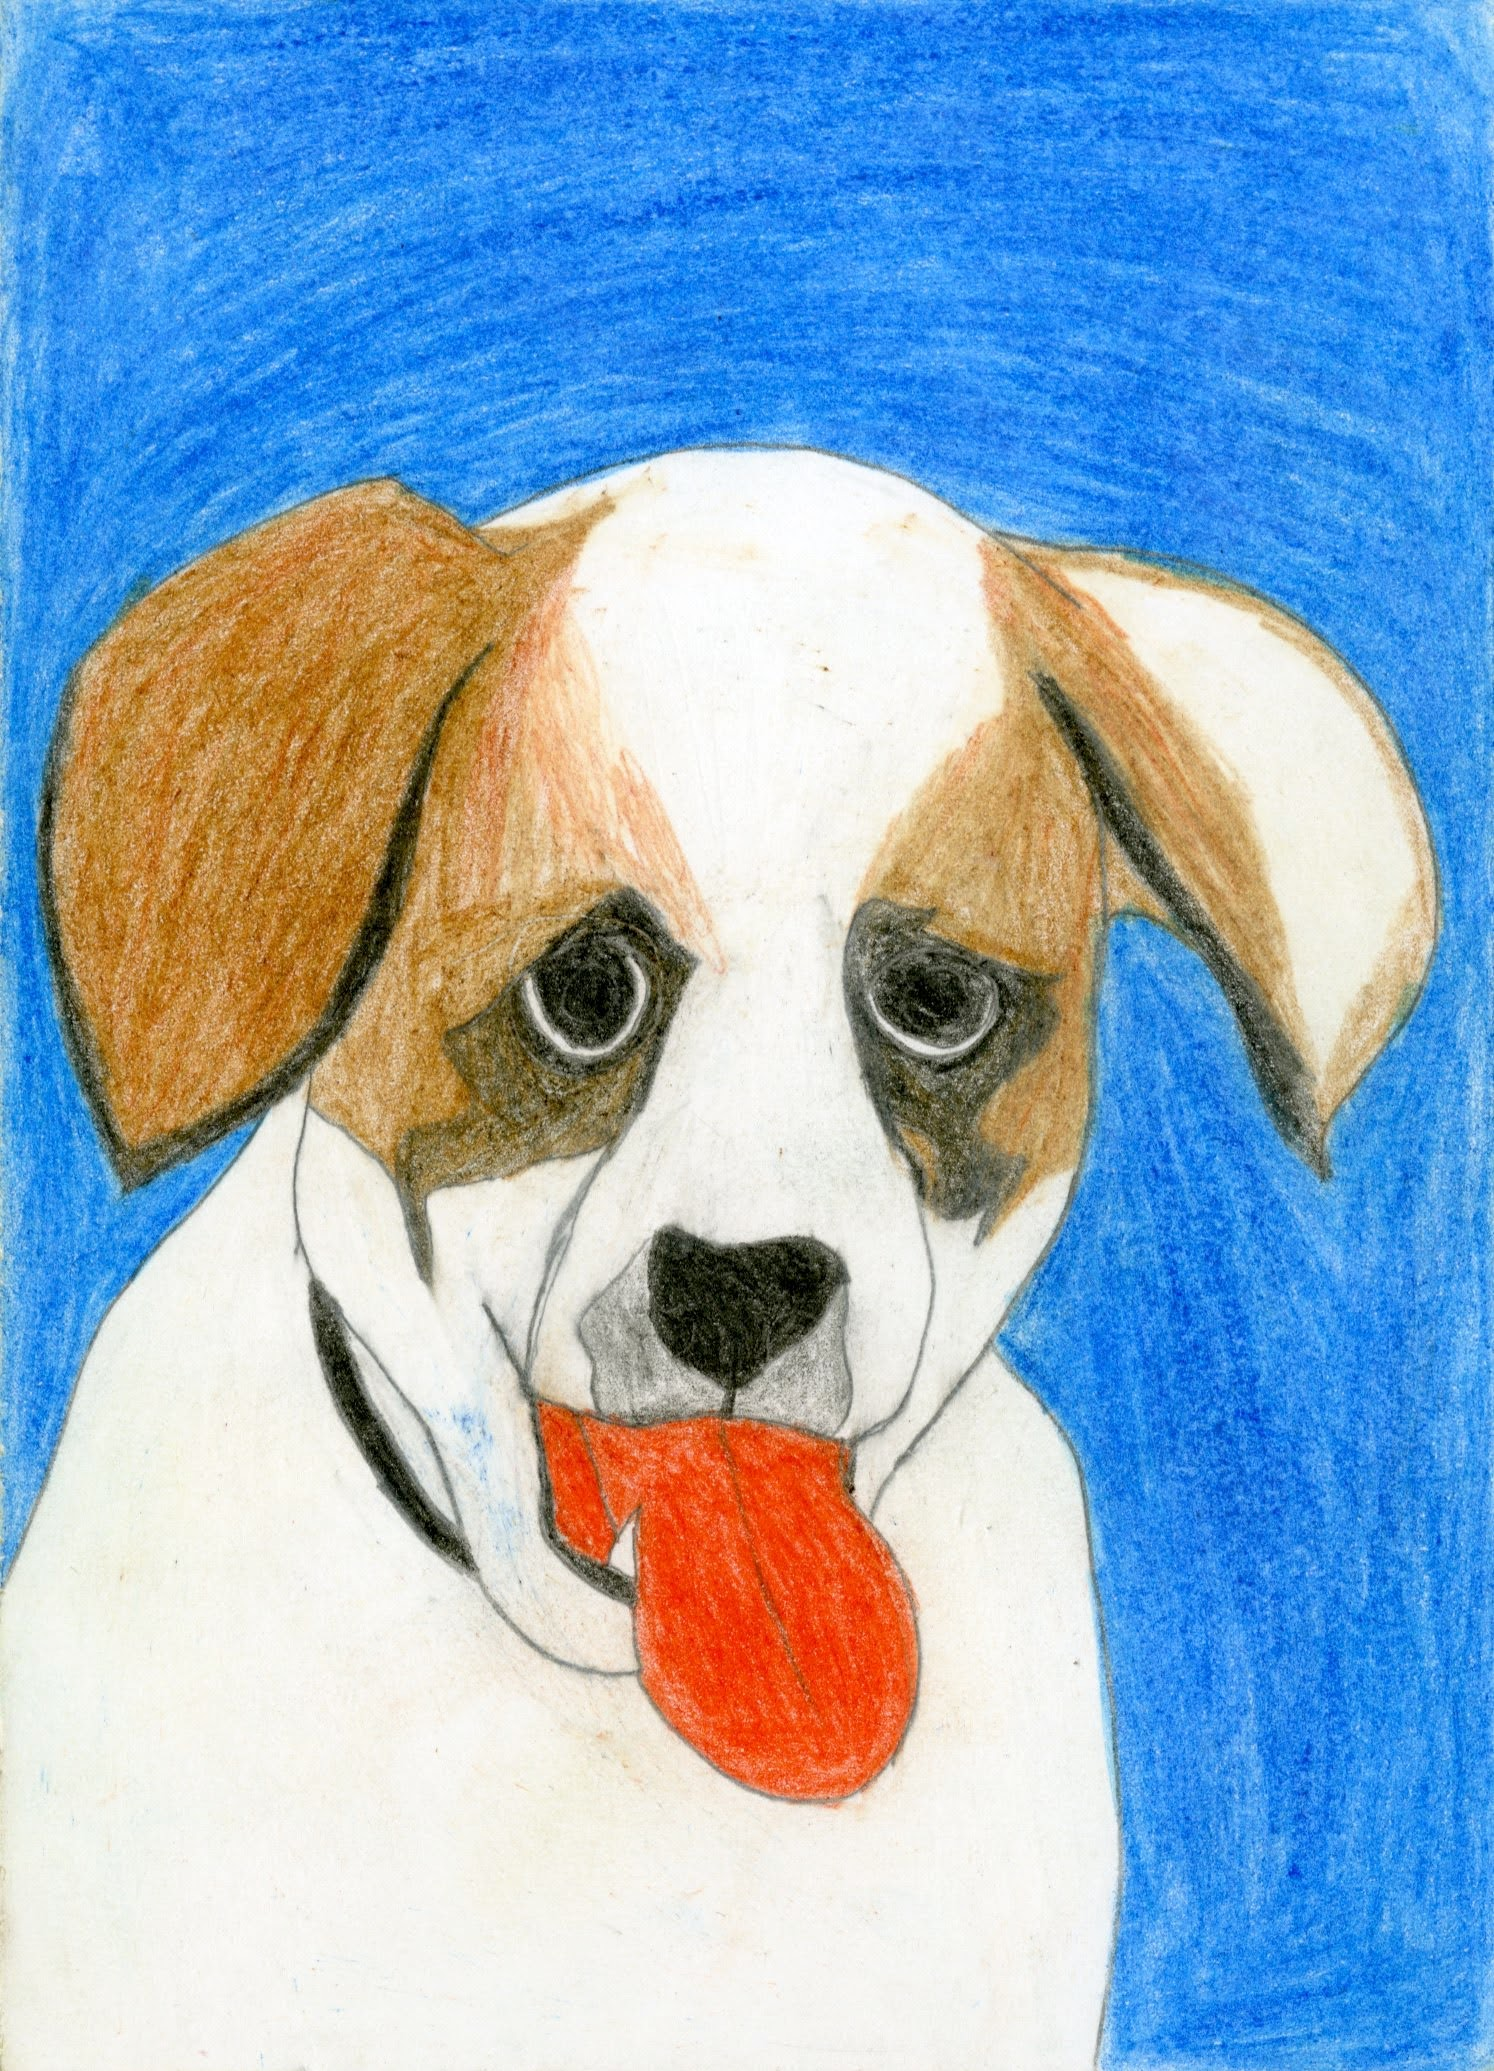 """Happy Dog"" by Shandrewick Key"